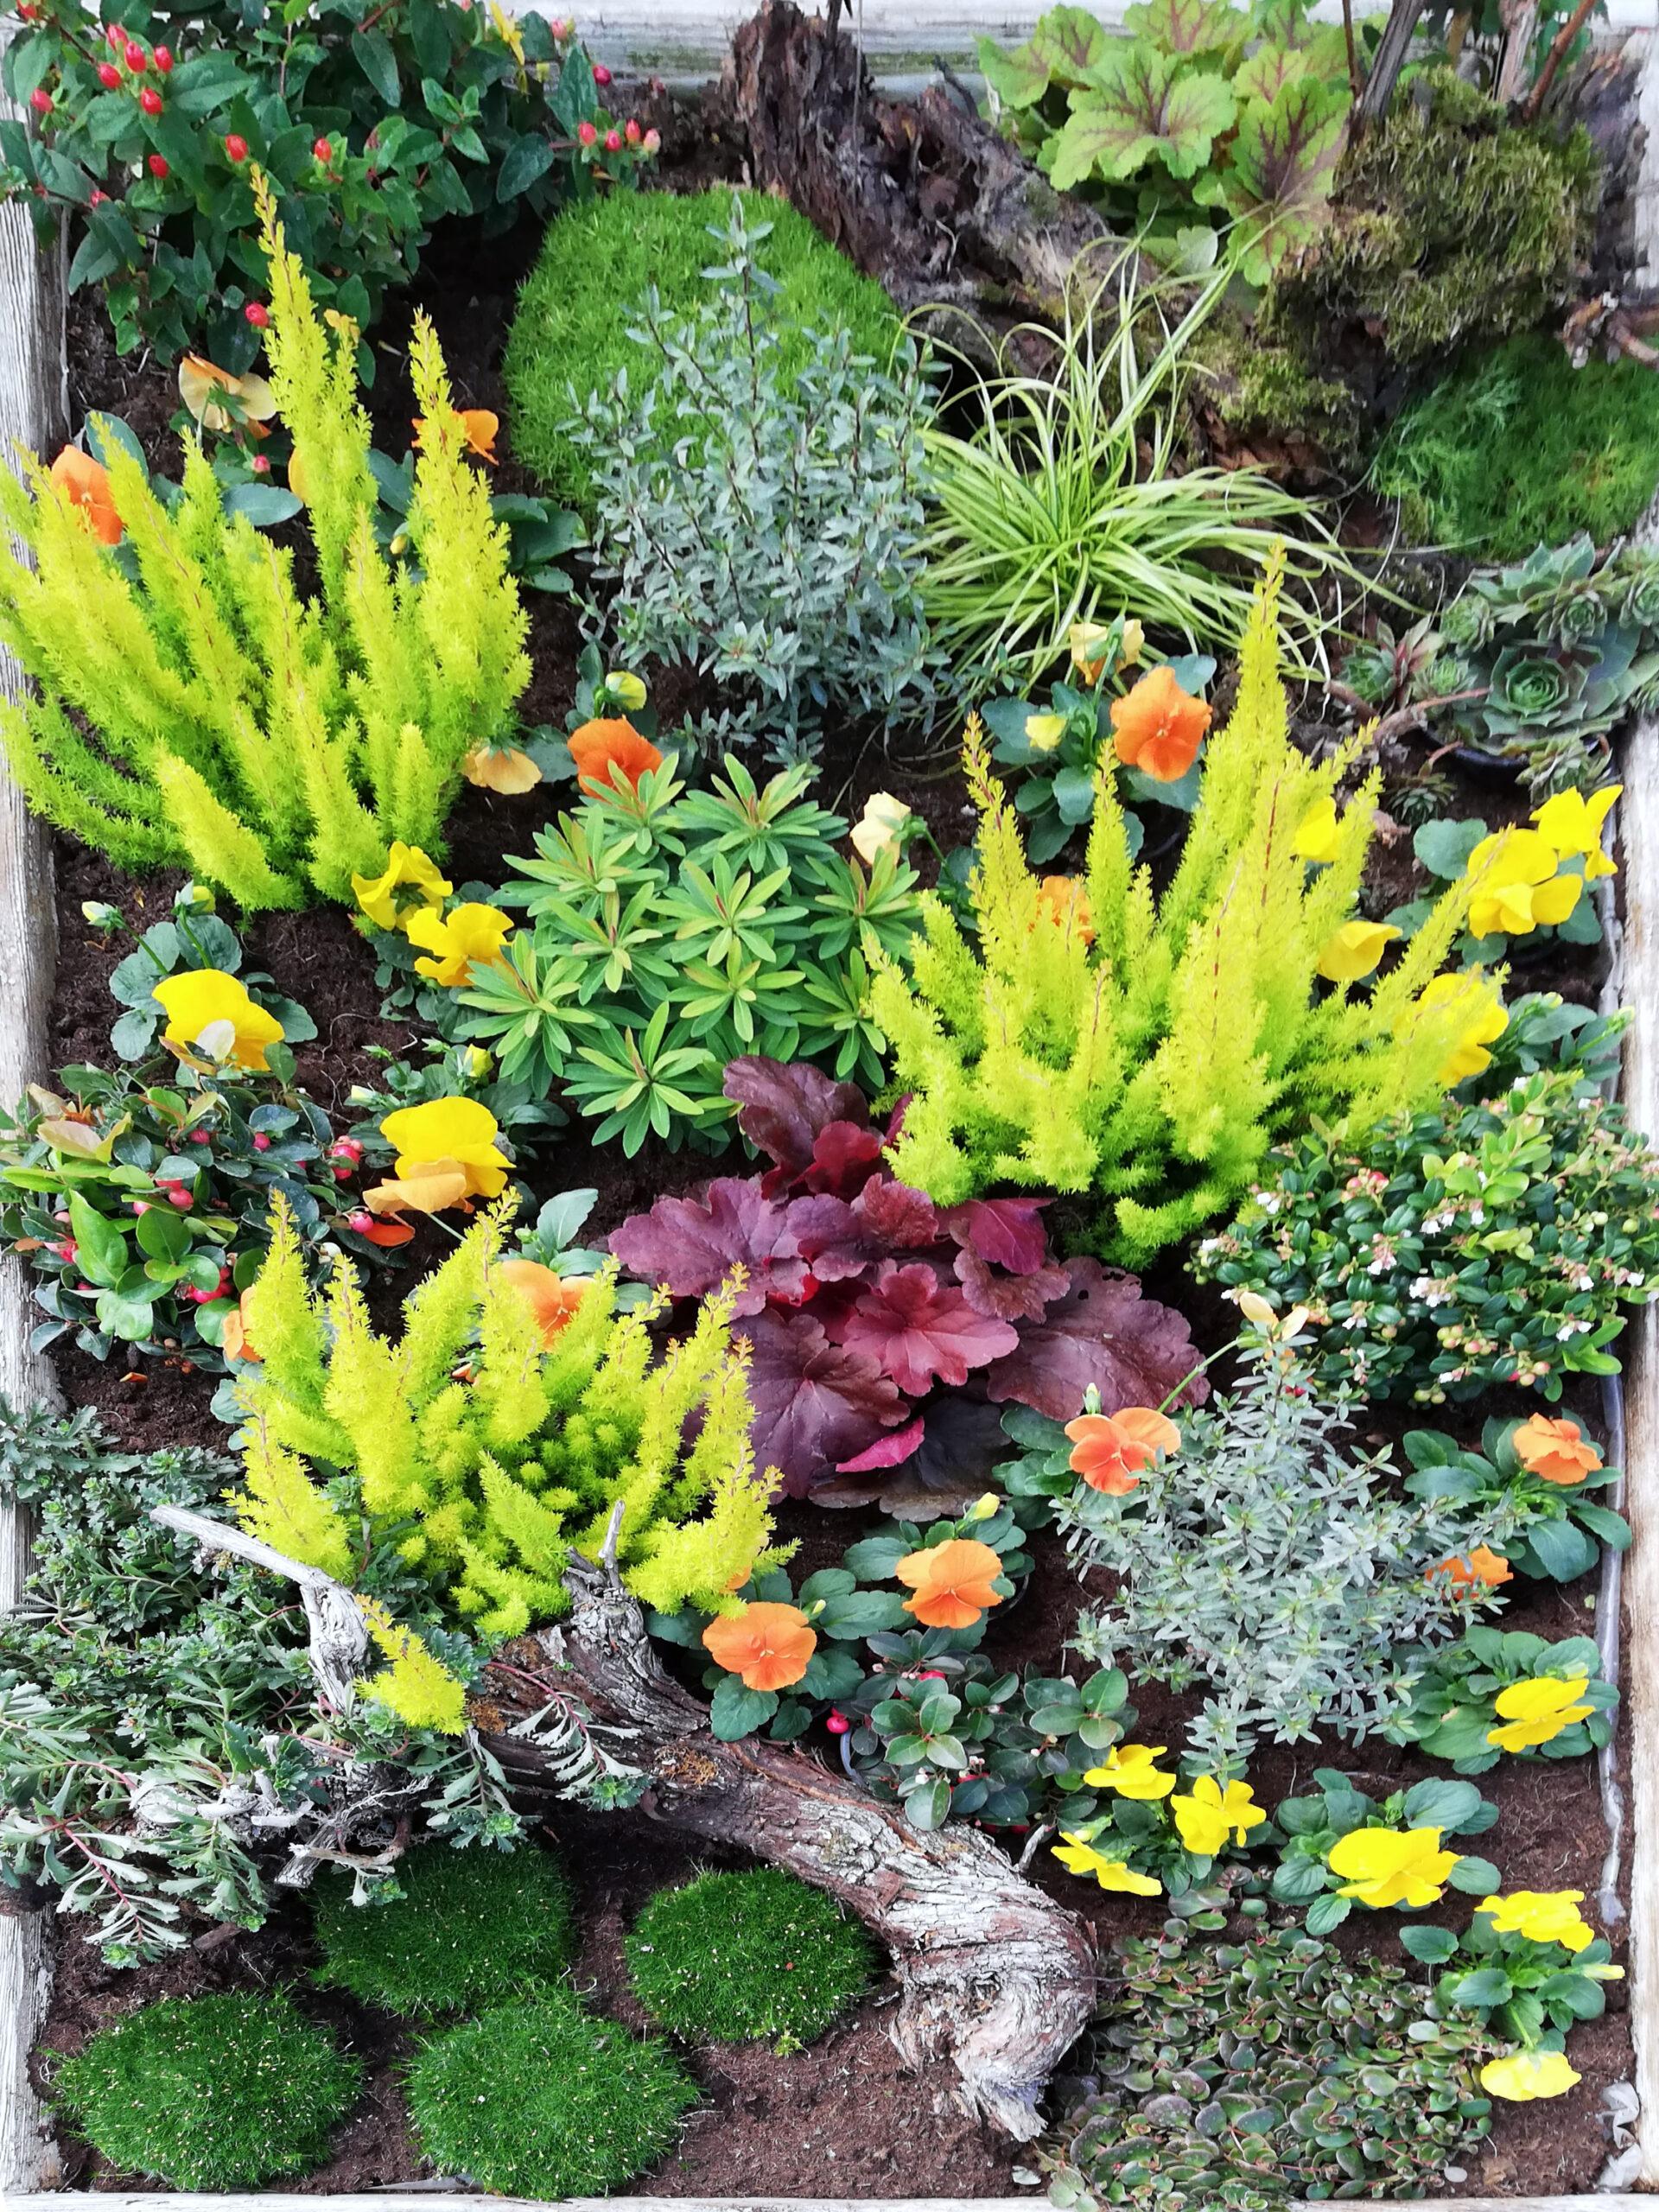 Grab Bepflanzung Gelb rot grün